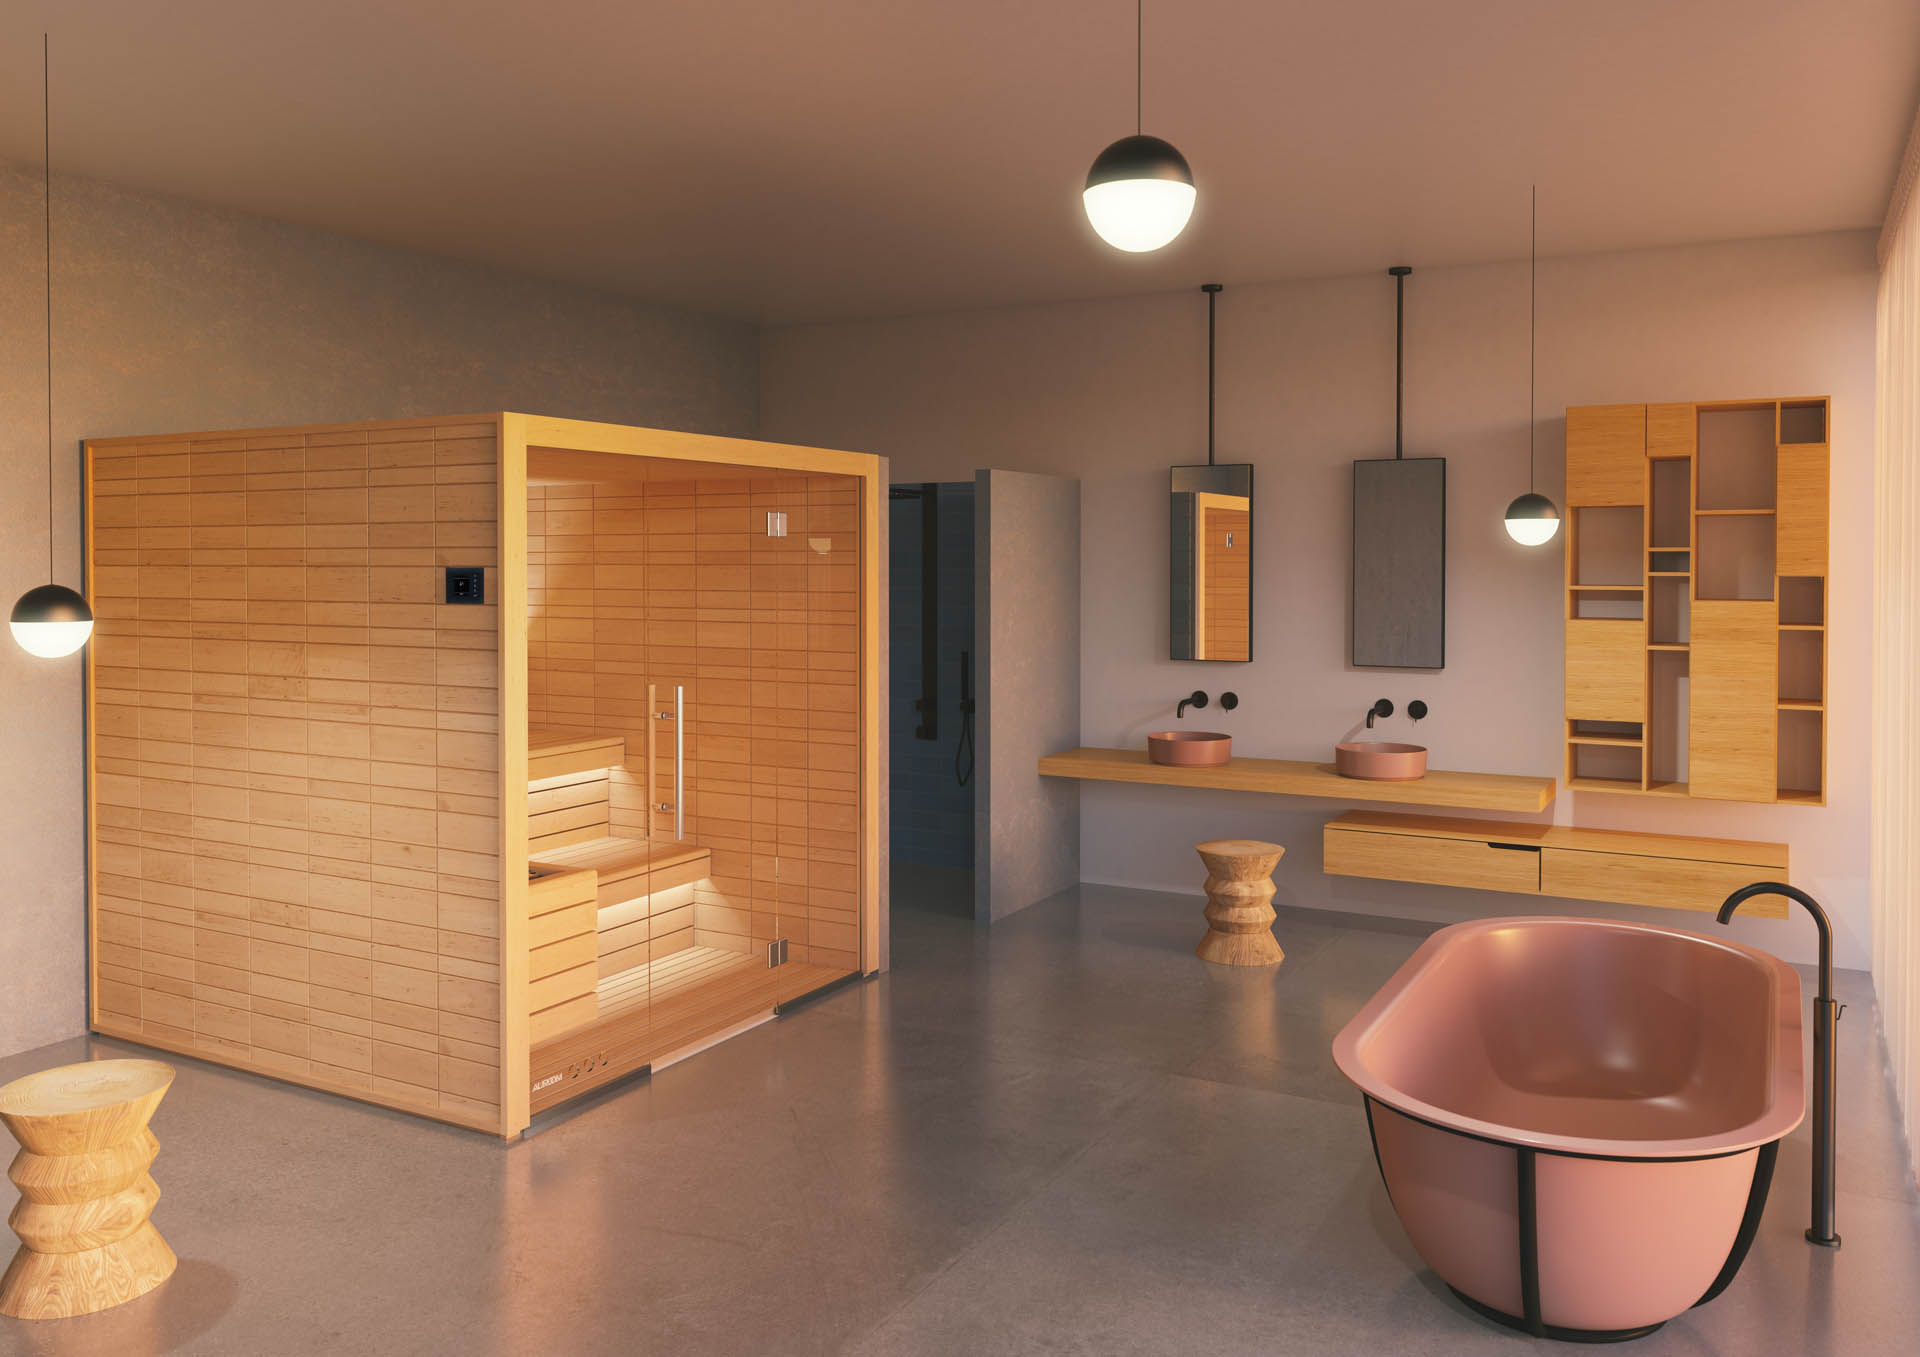 Electa_interior-bathroom_alder_200x200_auroom-1.jpg